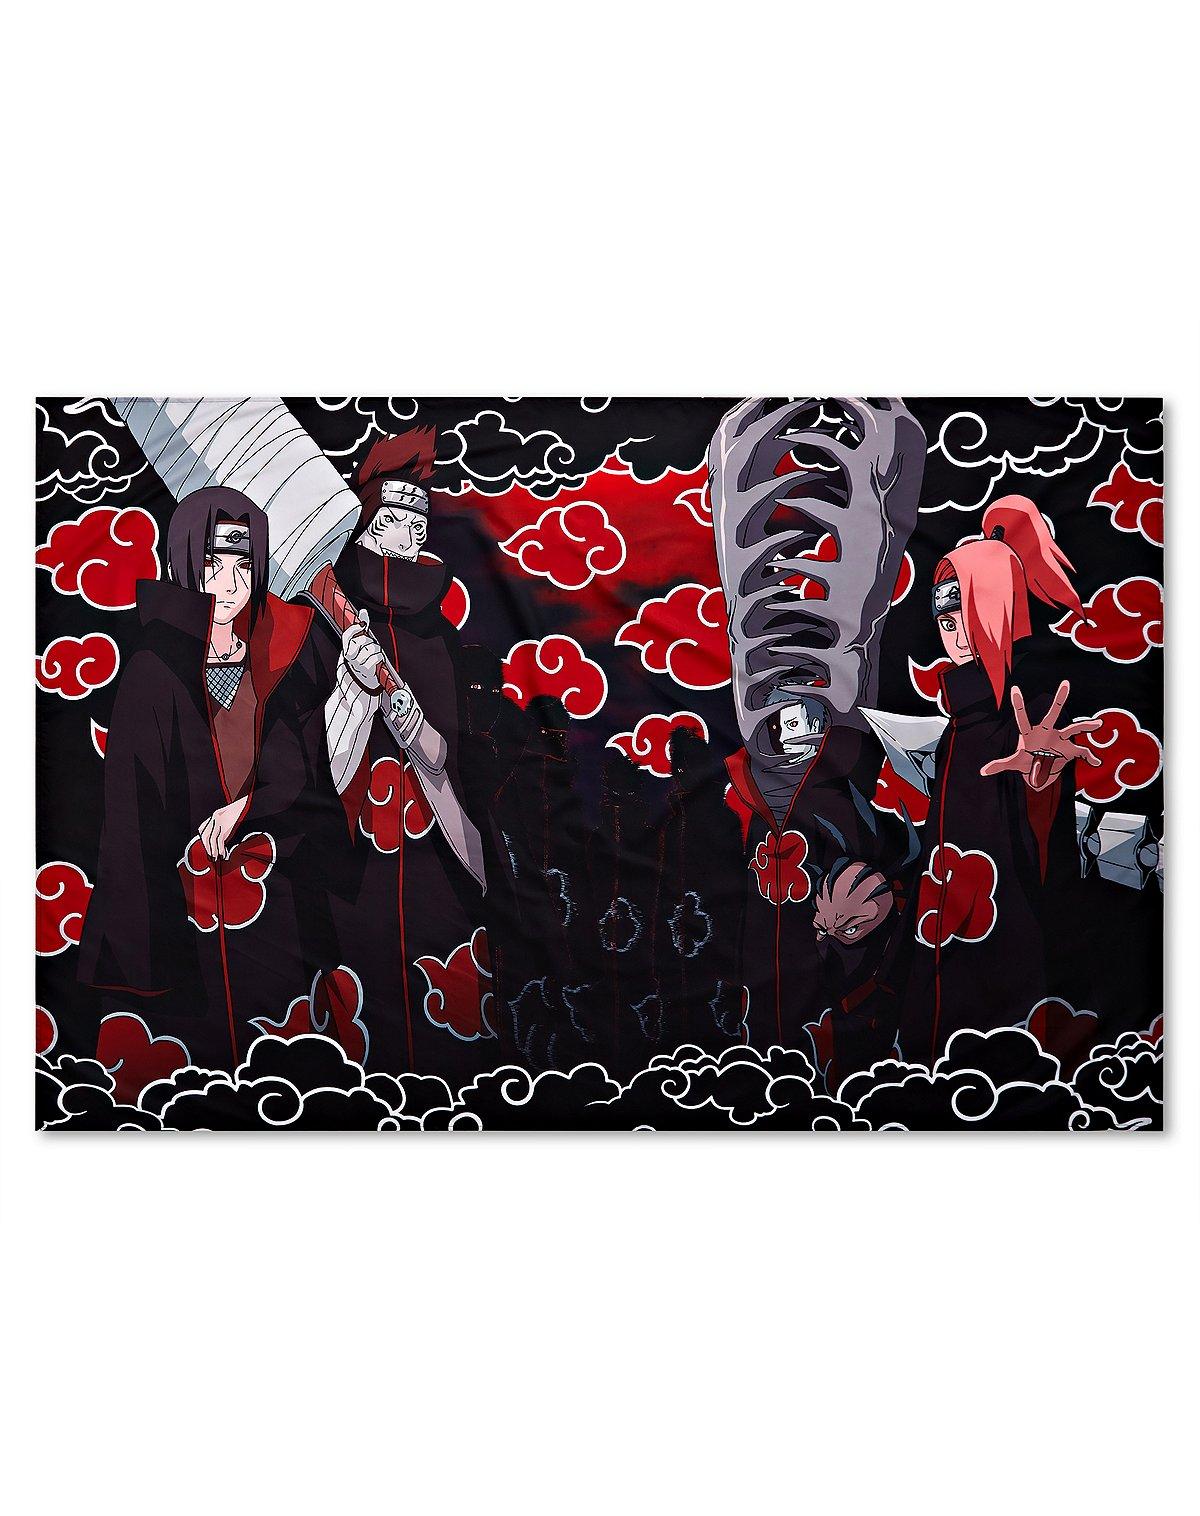 Naruto Characters Tapestry